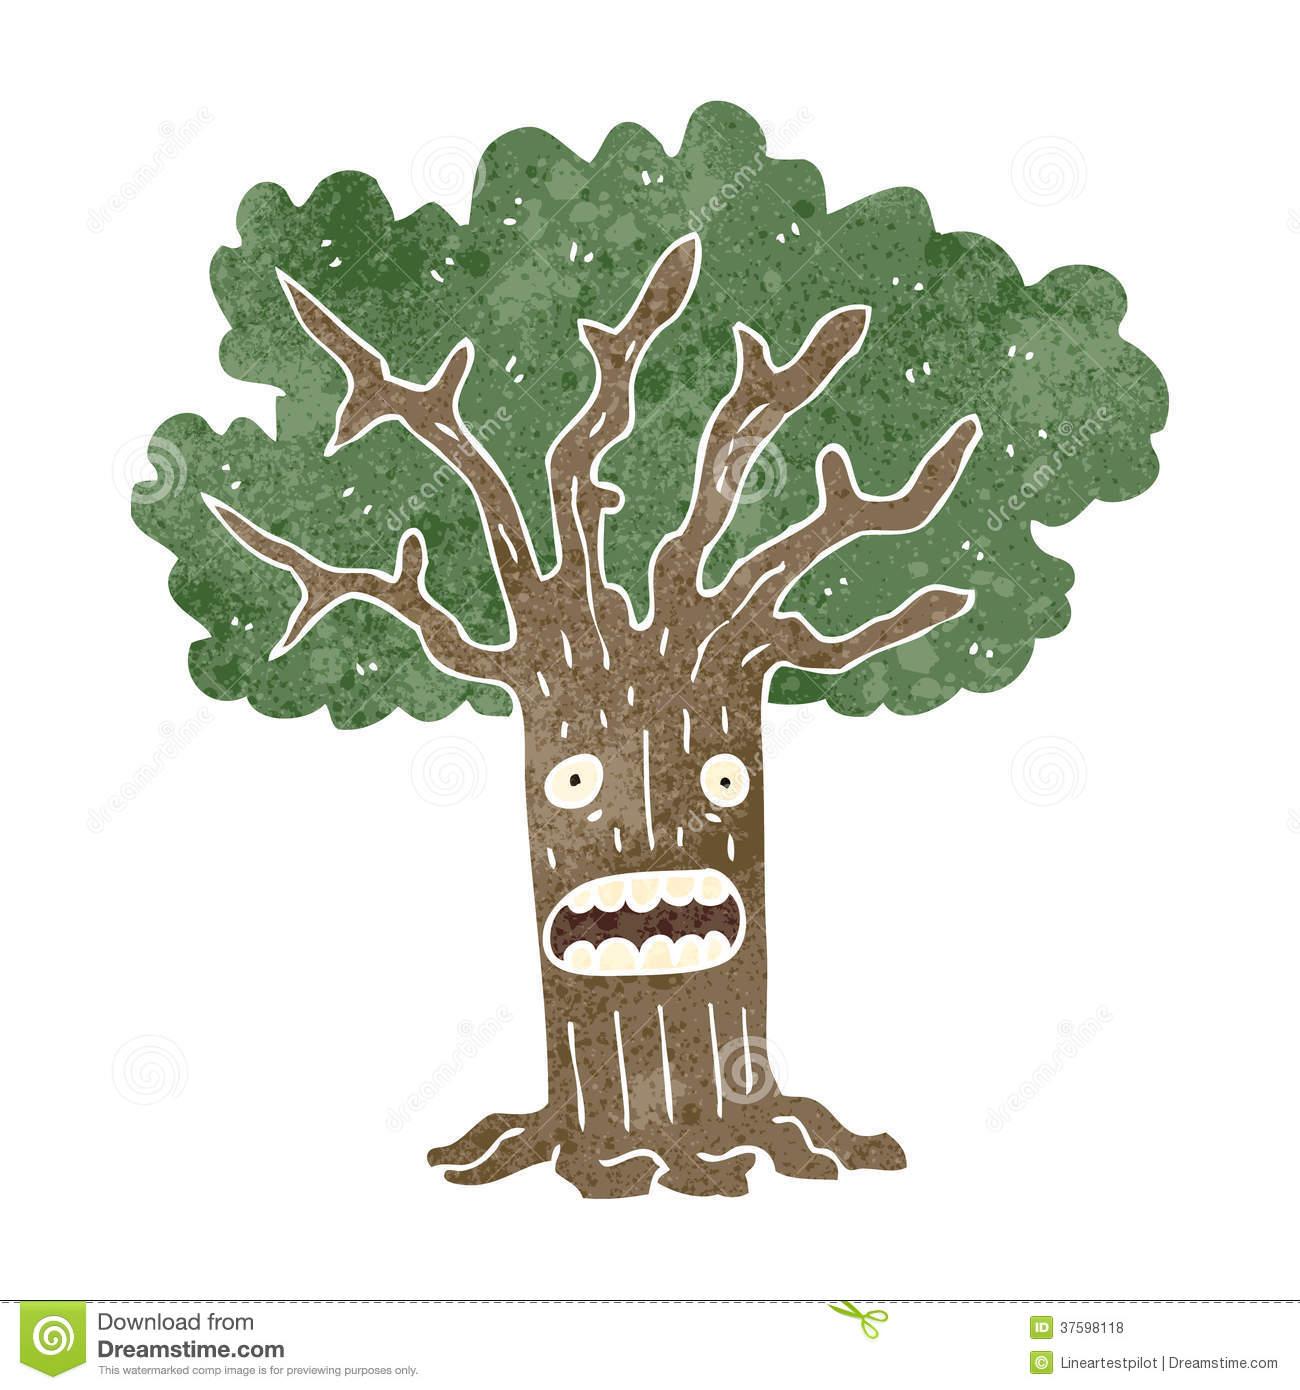 Retro Cartoon Tree With Worried Face Royalty Free Stock Photos.